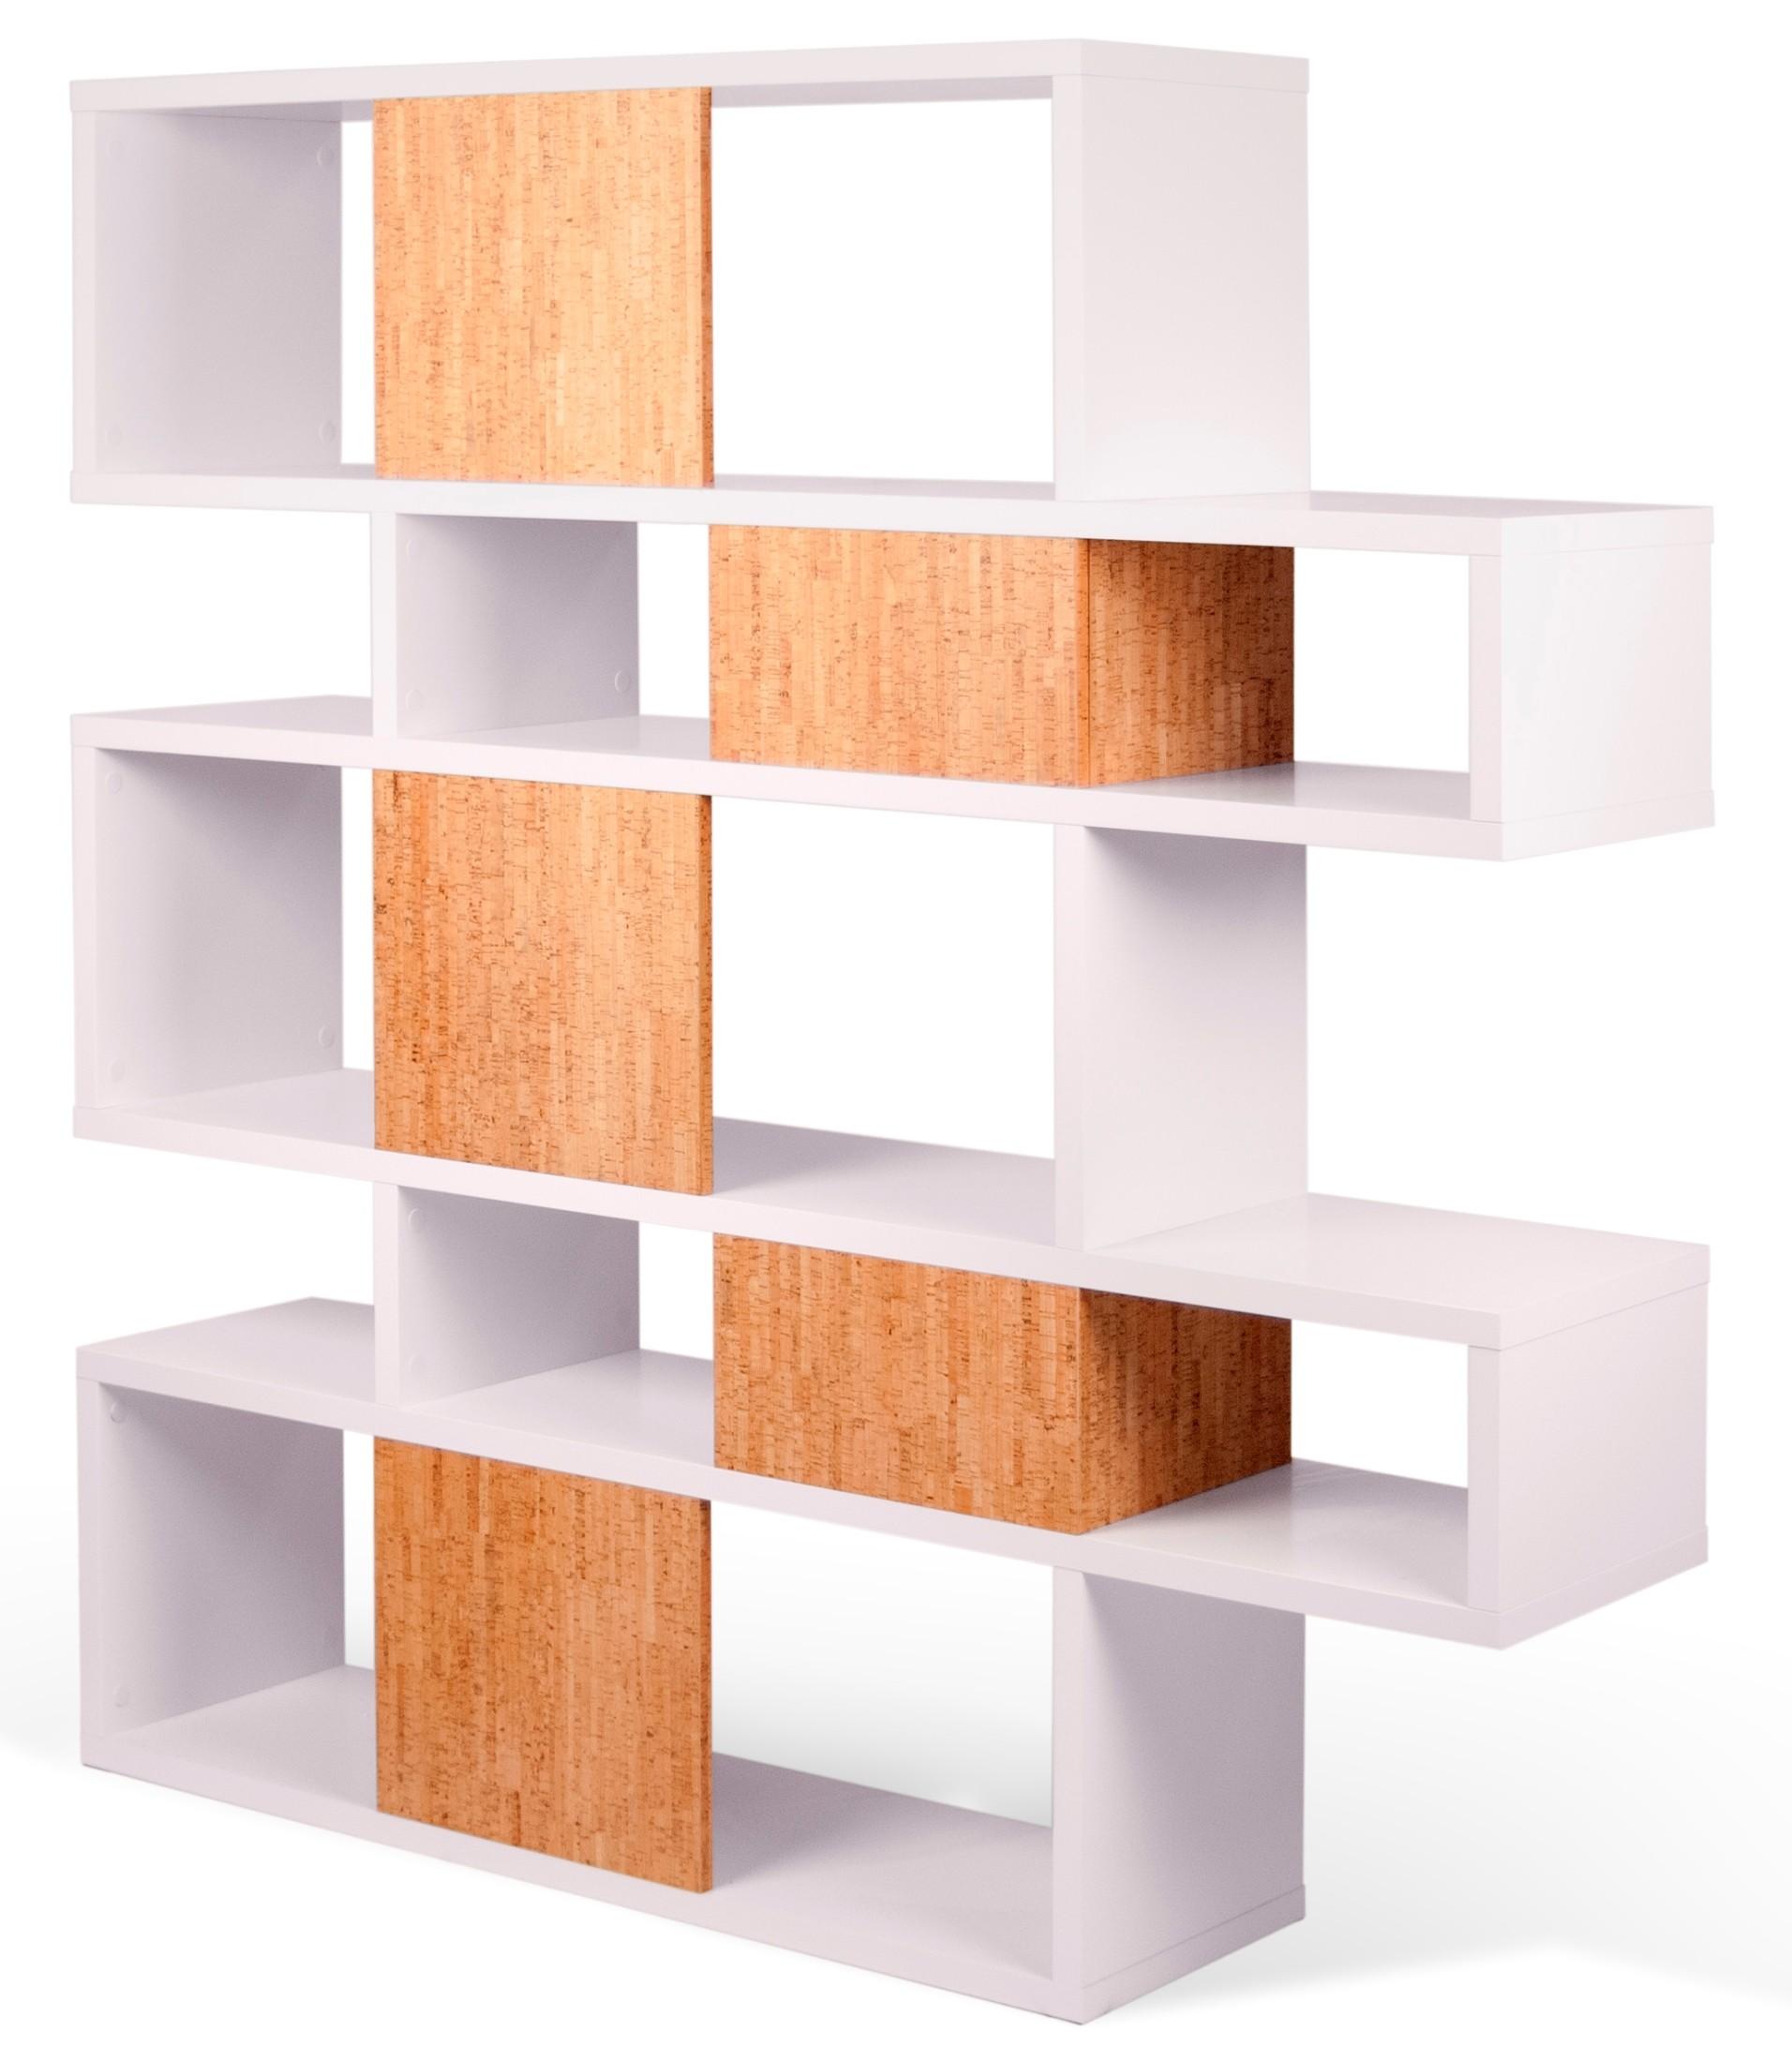 London Pure White Frame With Cork Backs 10 Shelf Bookcase